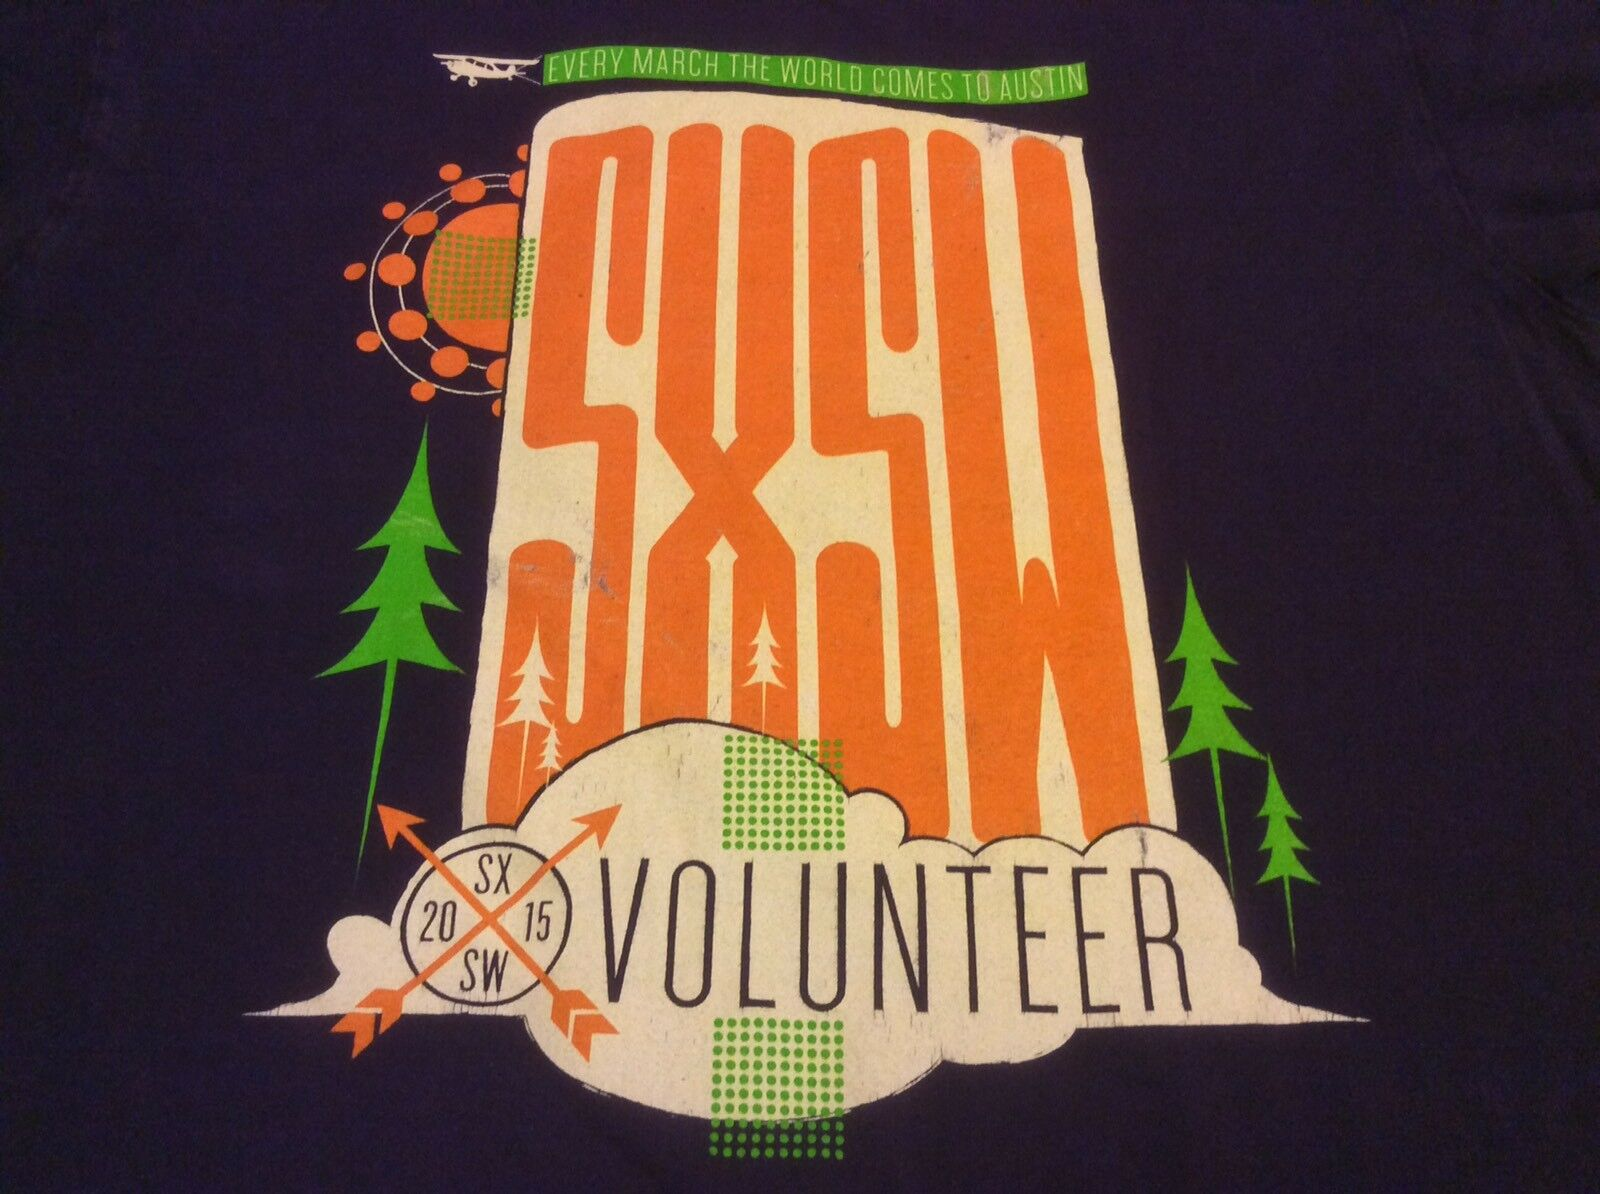 Sxsw 2015 South By Southwest Music Festival Volunteer Local Crew T-Shirt Unisex Size S-3Xl